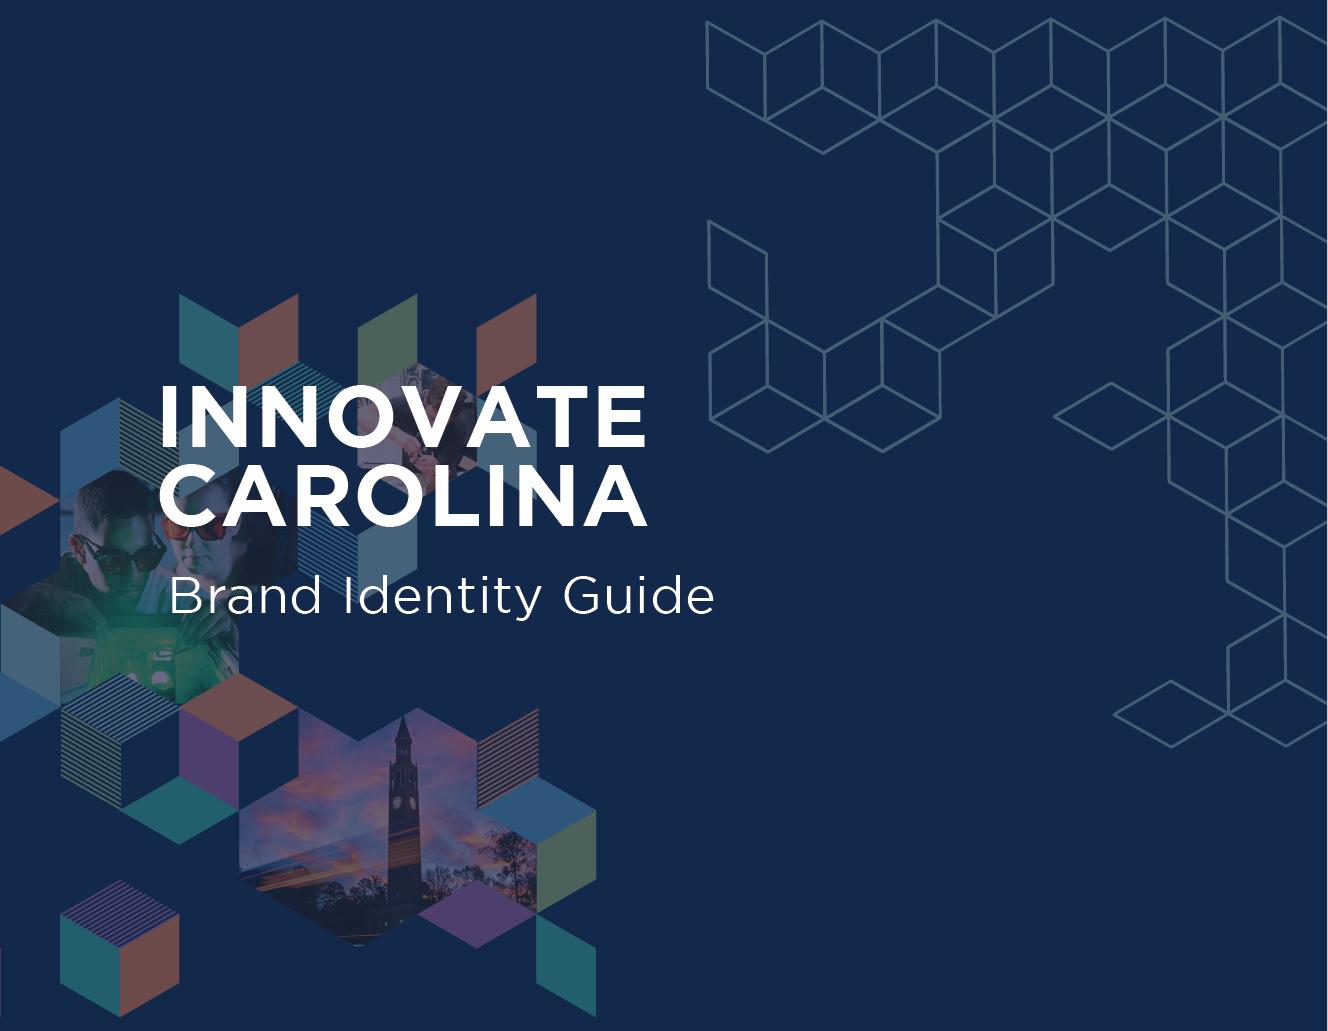 brand-identity-guide-cover